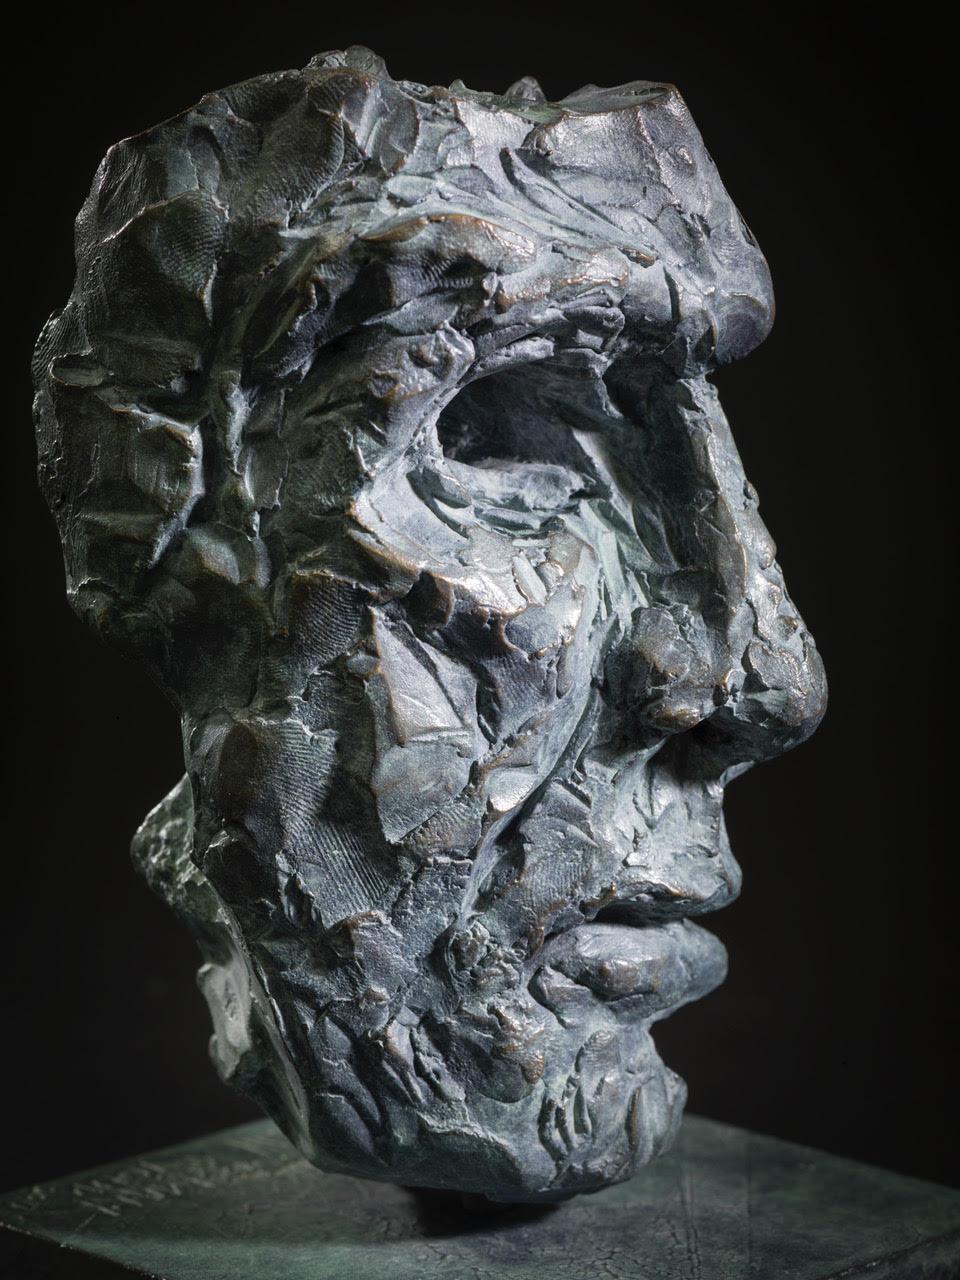 Fragment LIII - Bronze SculptureEdition: 1 of 3£2,700.00